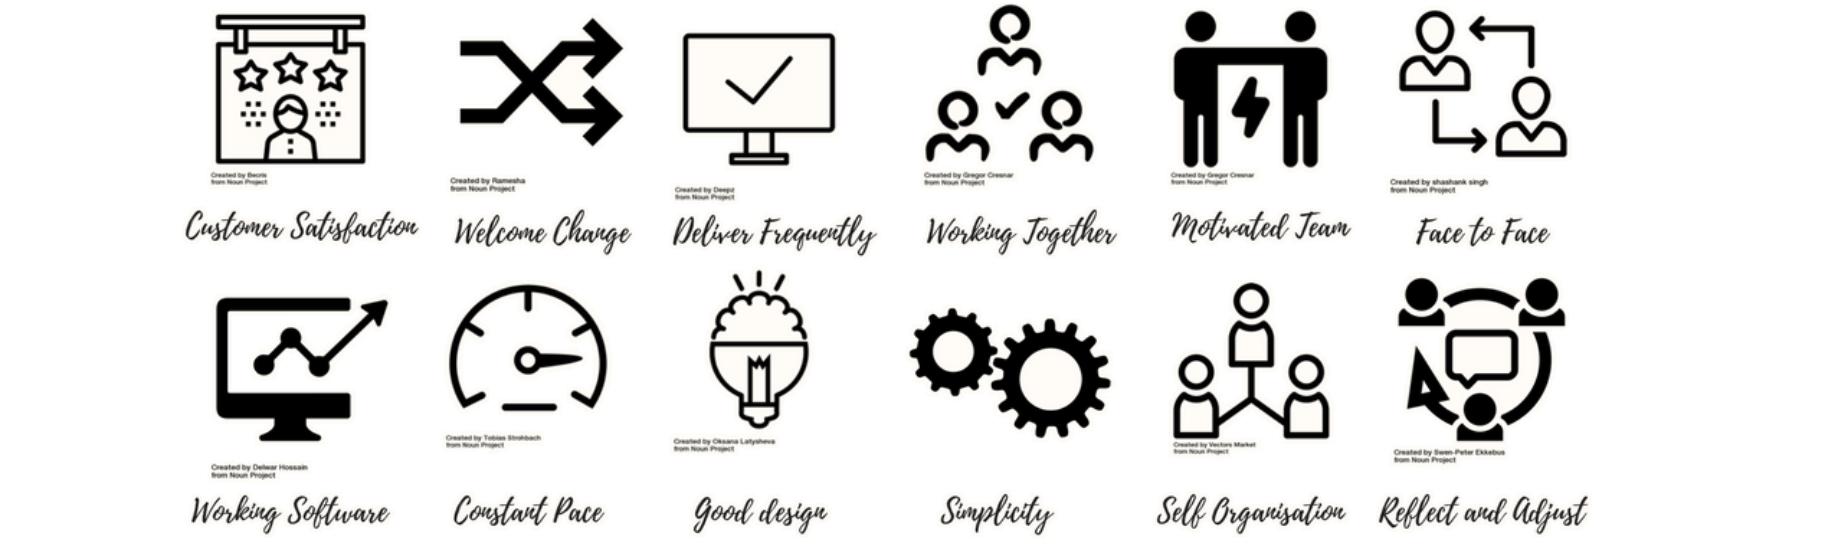 12 Agile Principles in 12 Sprints — Deep dive into Agile Manifesto